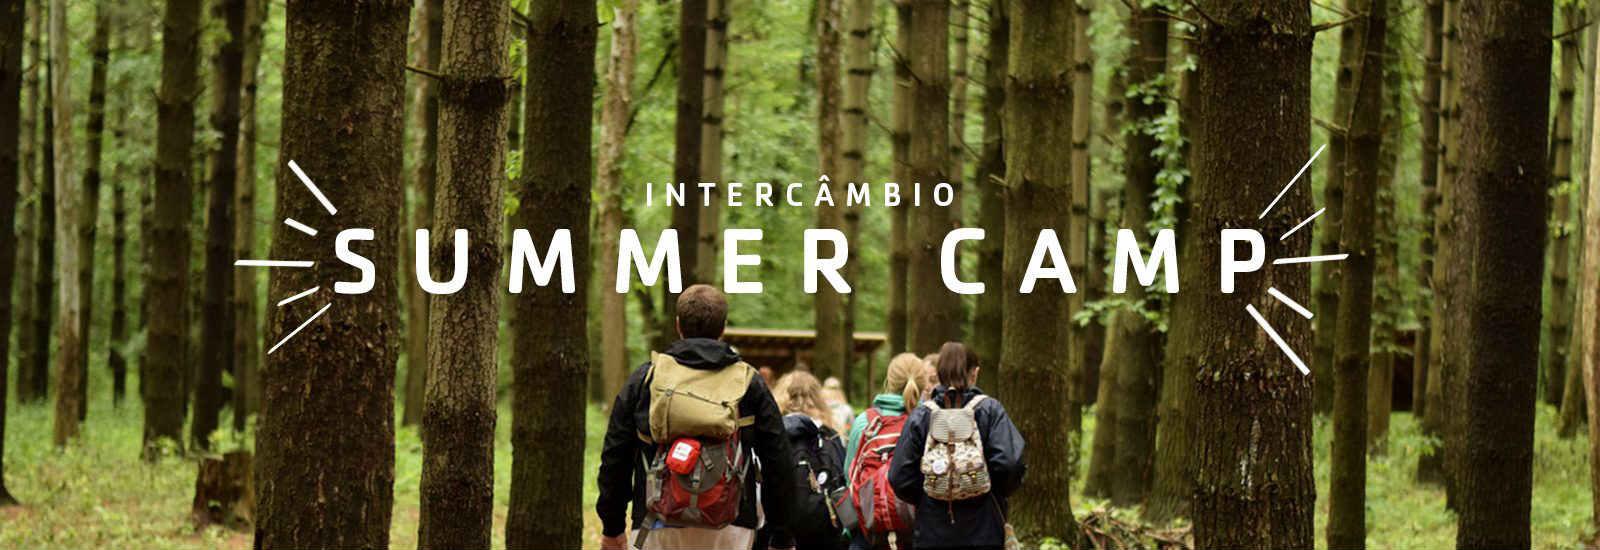 banner natureza esportes summer camp intercambio USA acampamento verao viagens jovens Belo horizonte ed - Viaje